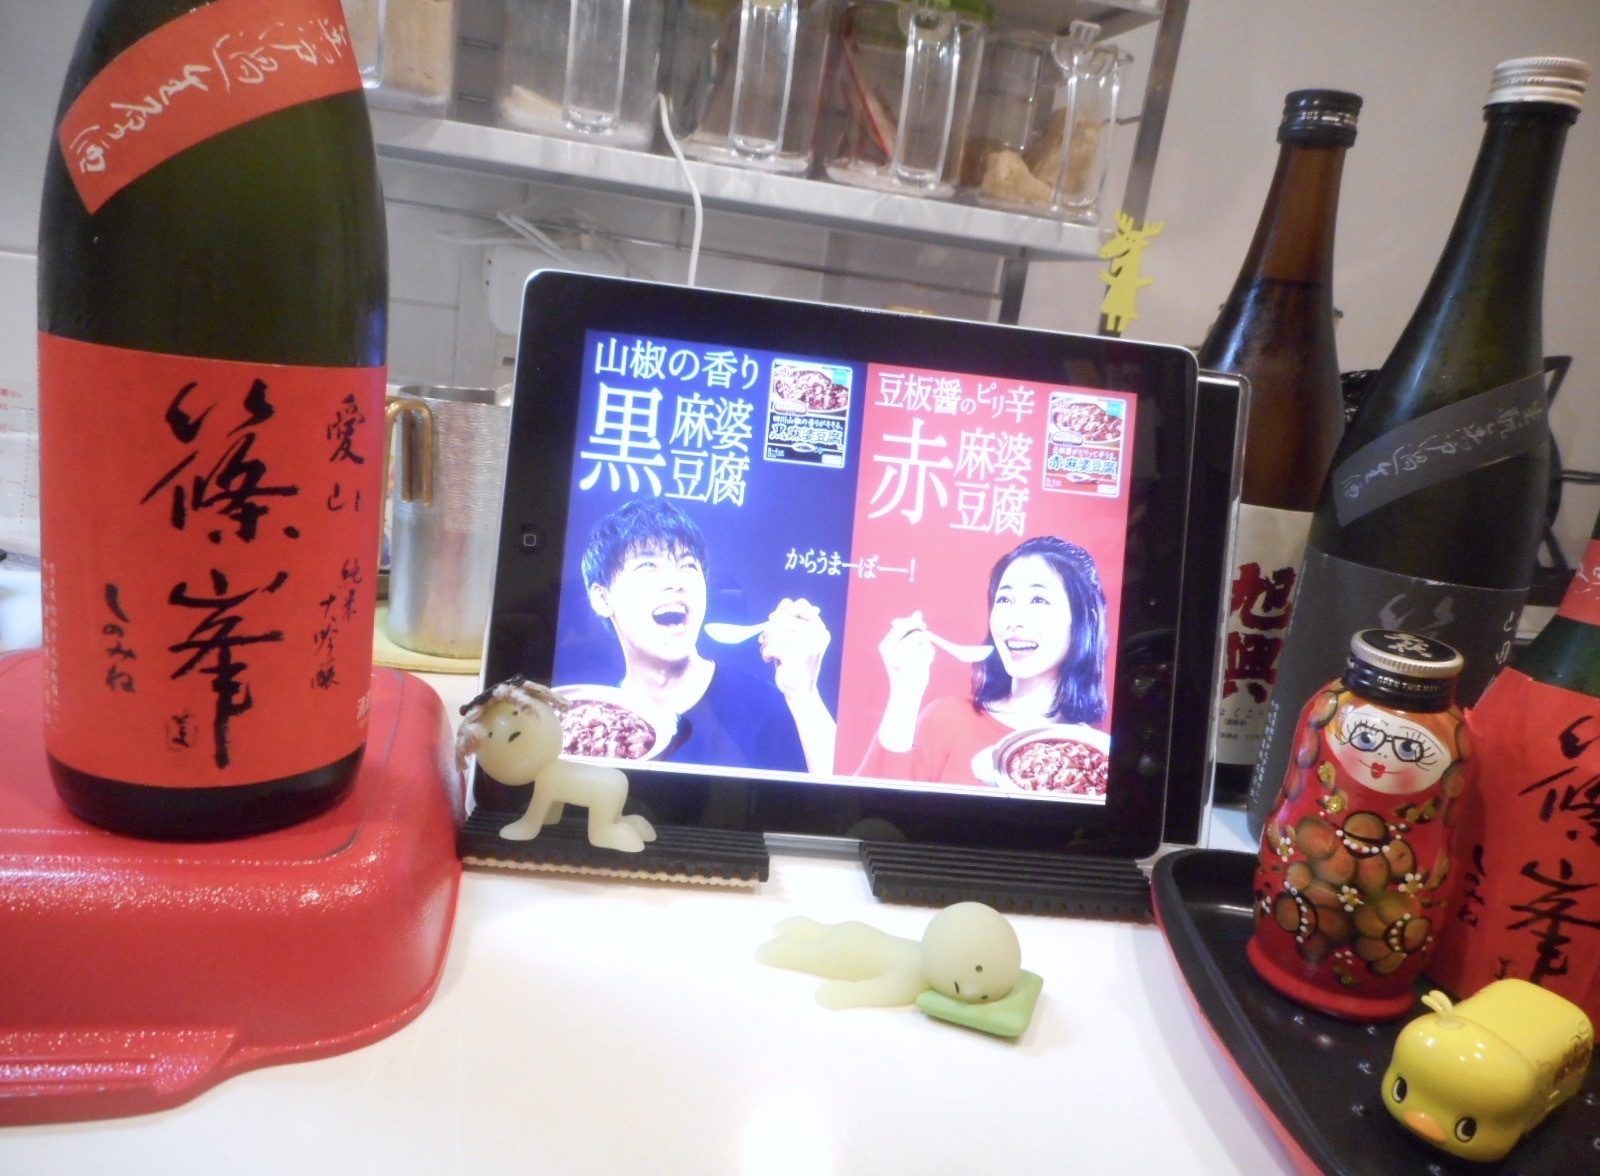 shinomine_aiyama45_29by3_1.jpg